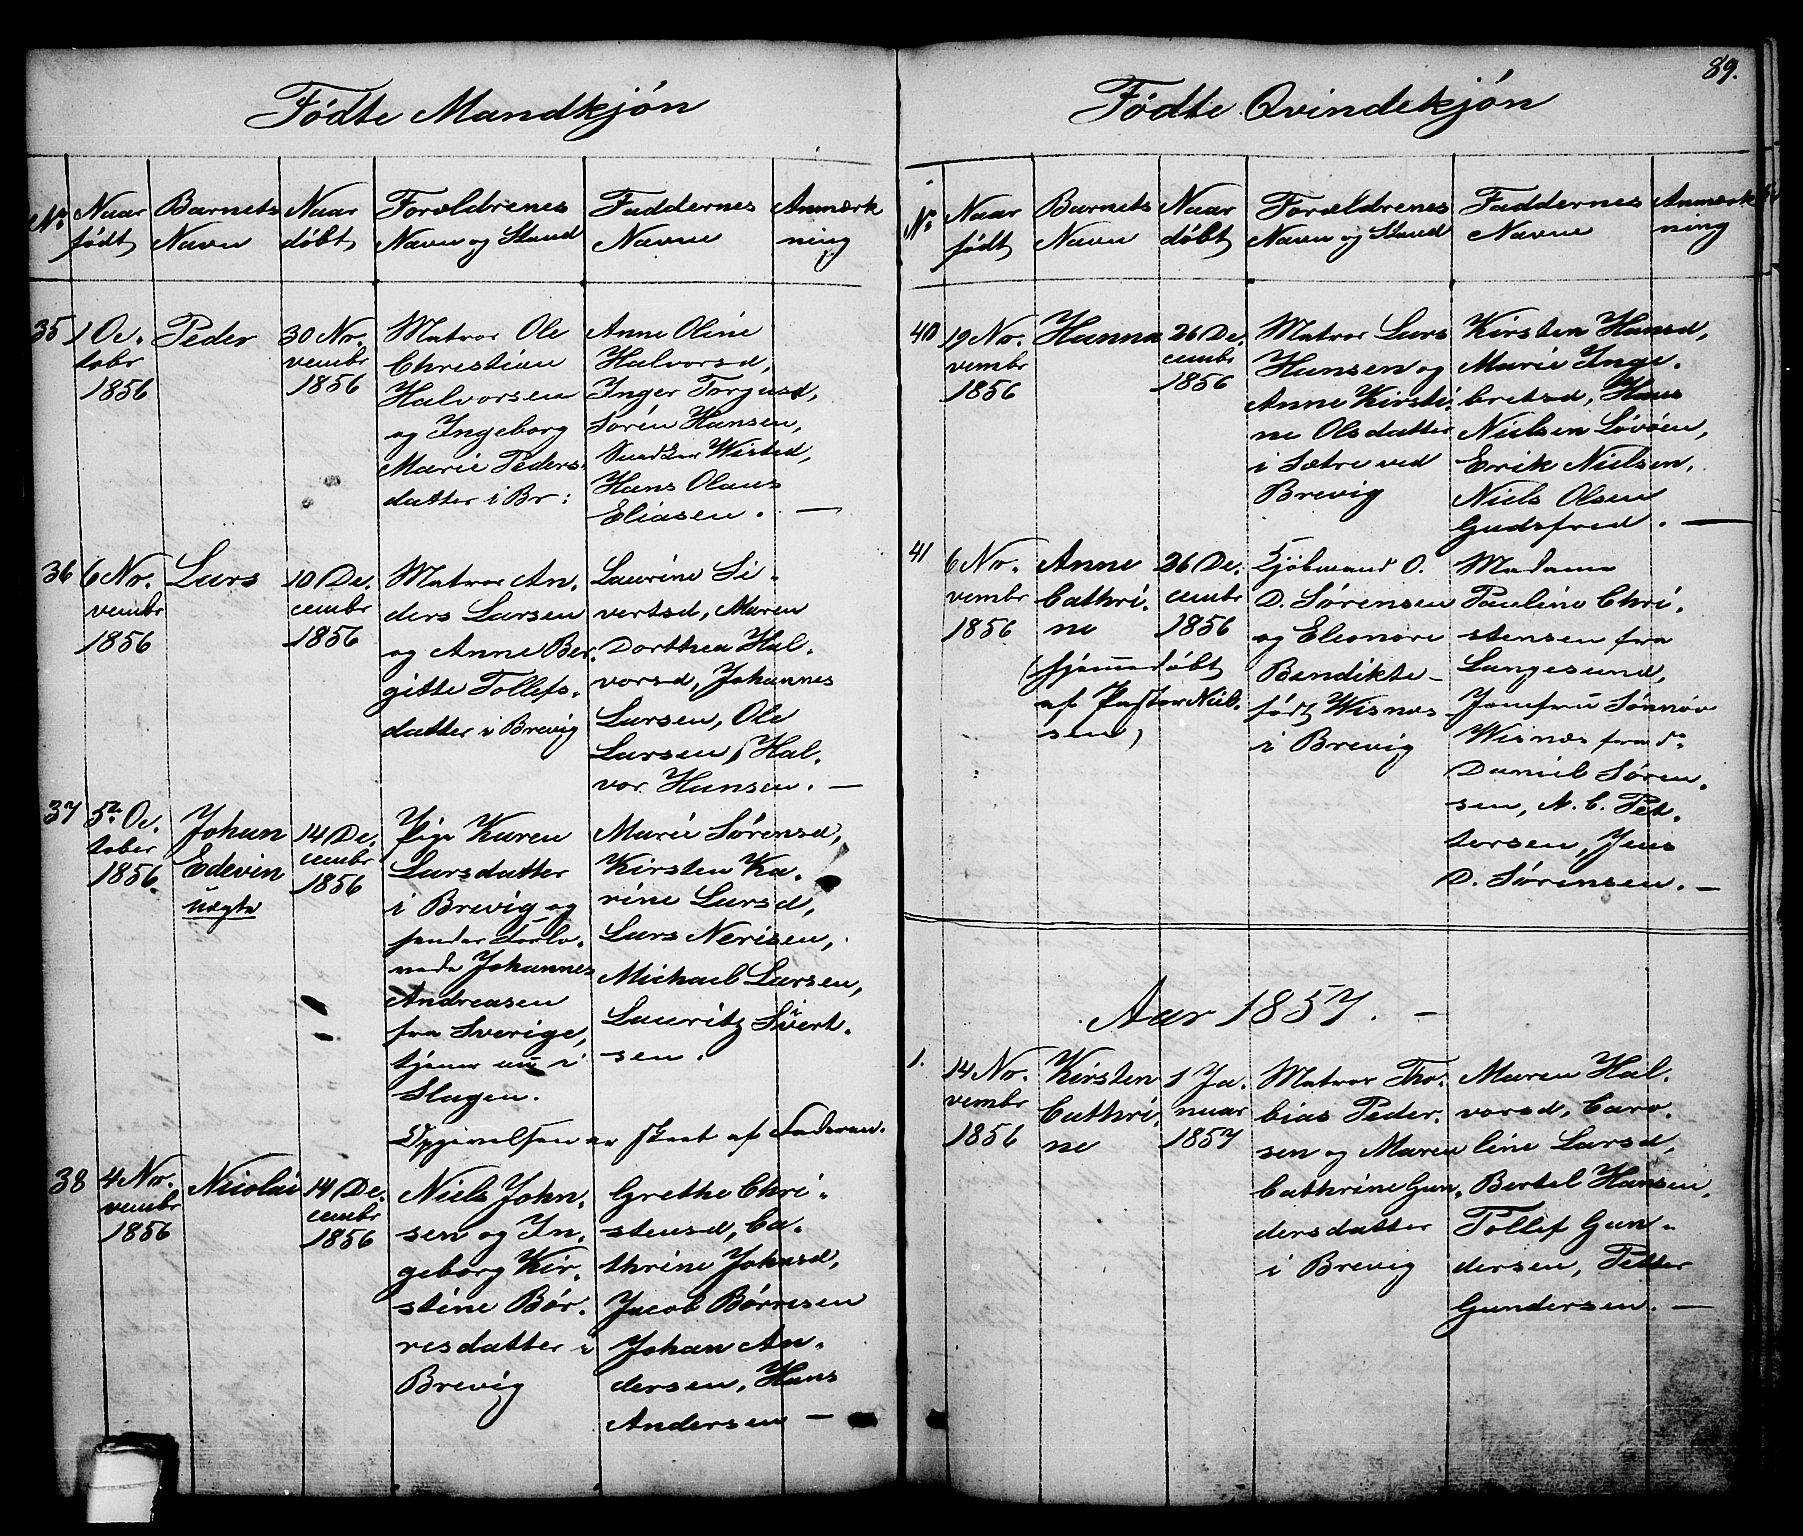 SAKO, Brevik kirkebøker, G/Ga/L0002: Klokkerbok nr. 2, 1846-1865, s. 89